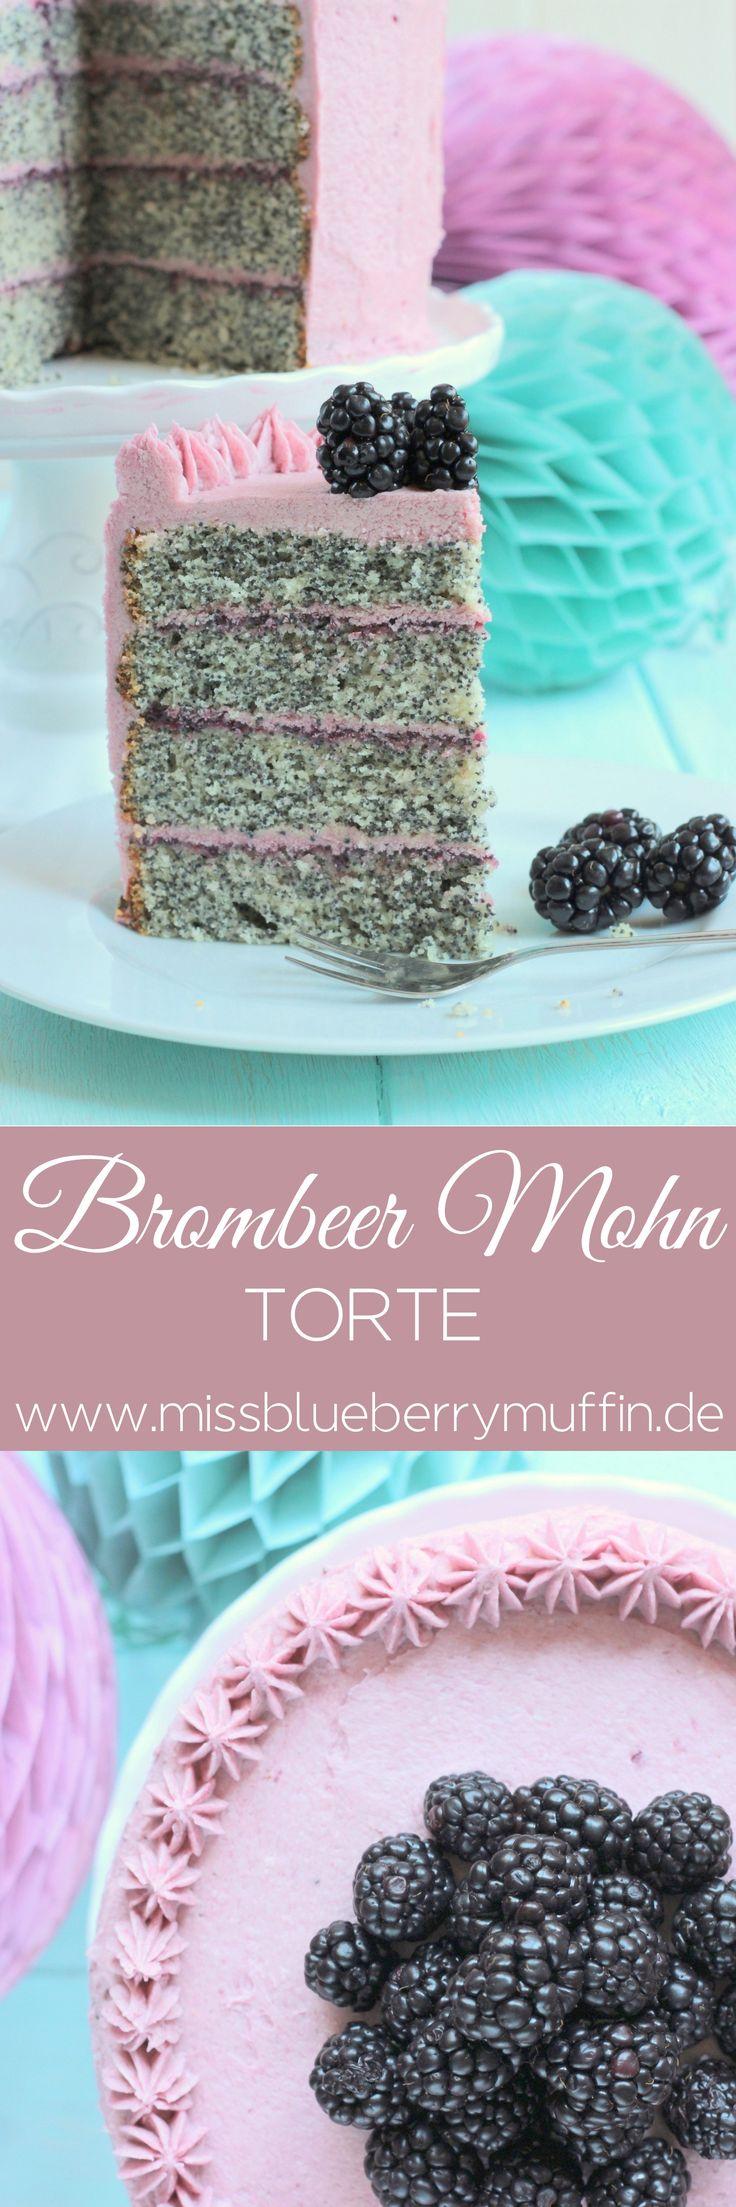 Zauberhafte Brombeer-Mohn-Torte mit Pudding-Buttercreme